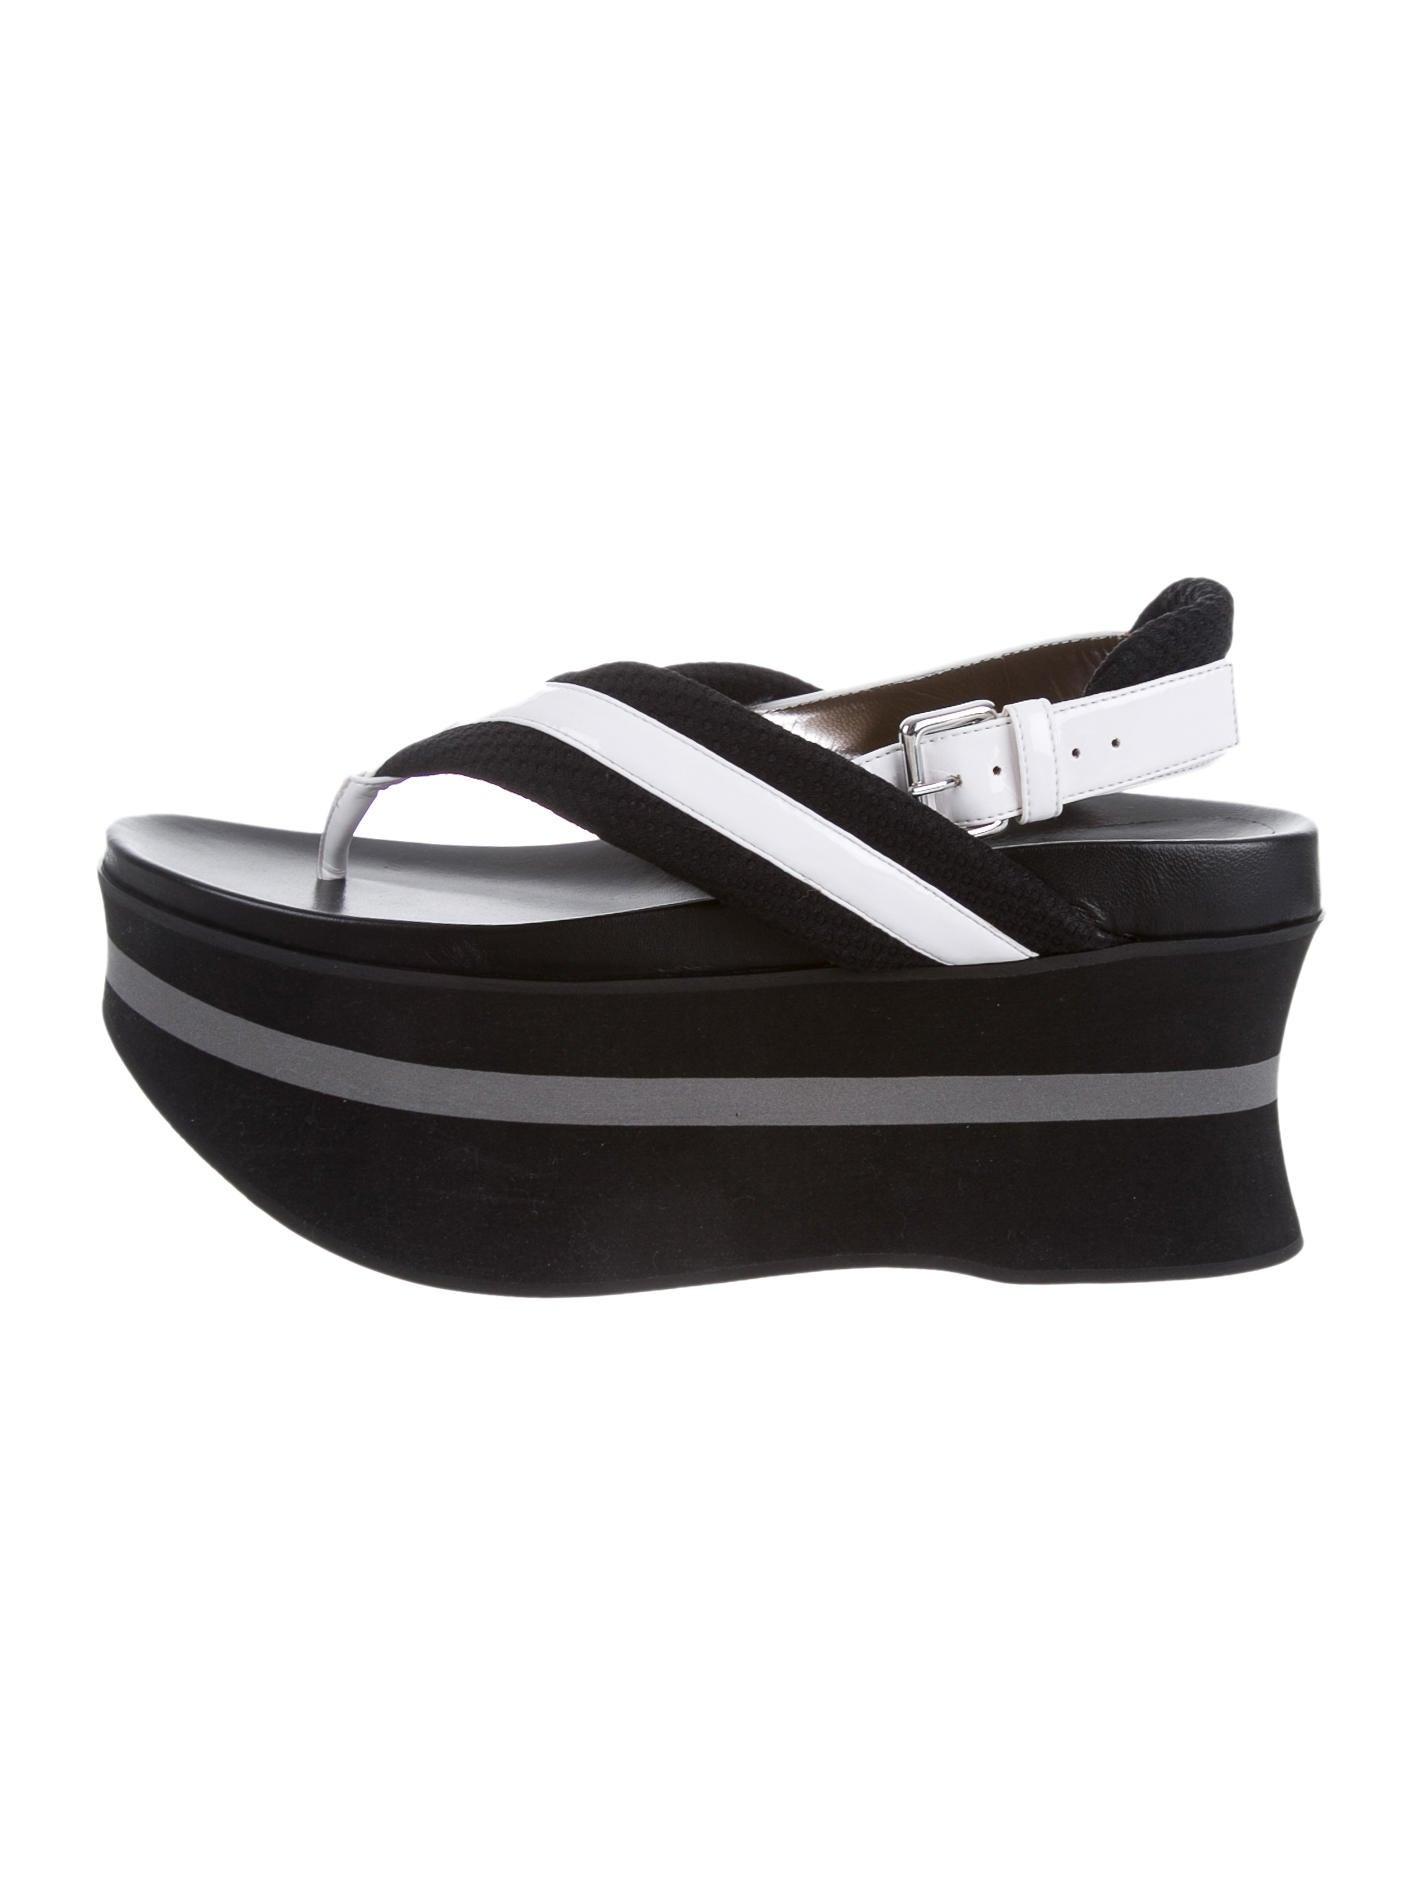 marni platform sandals shoes man30986 the realreal